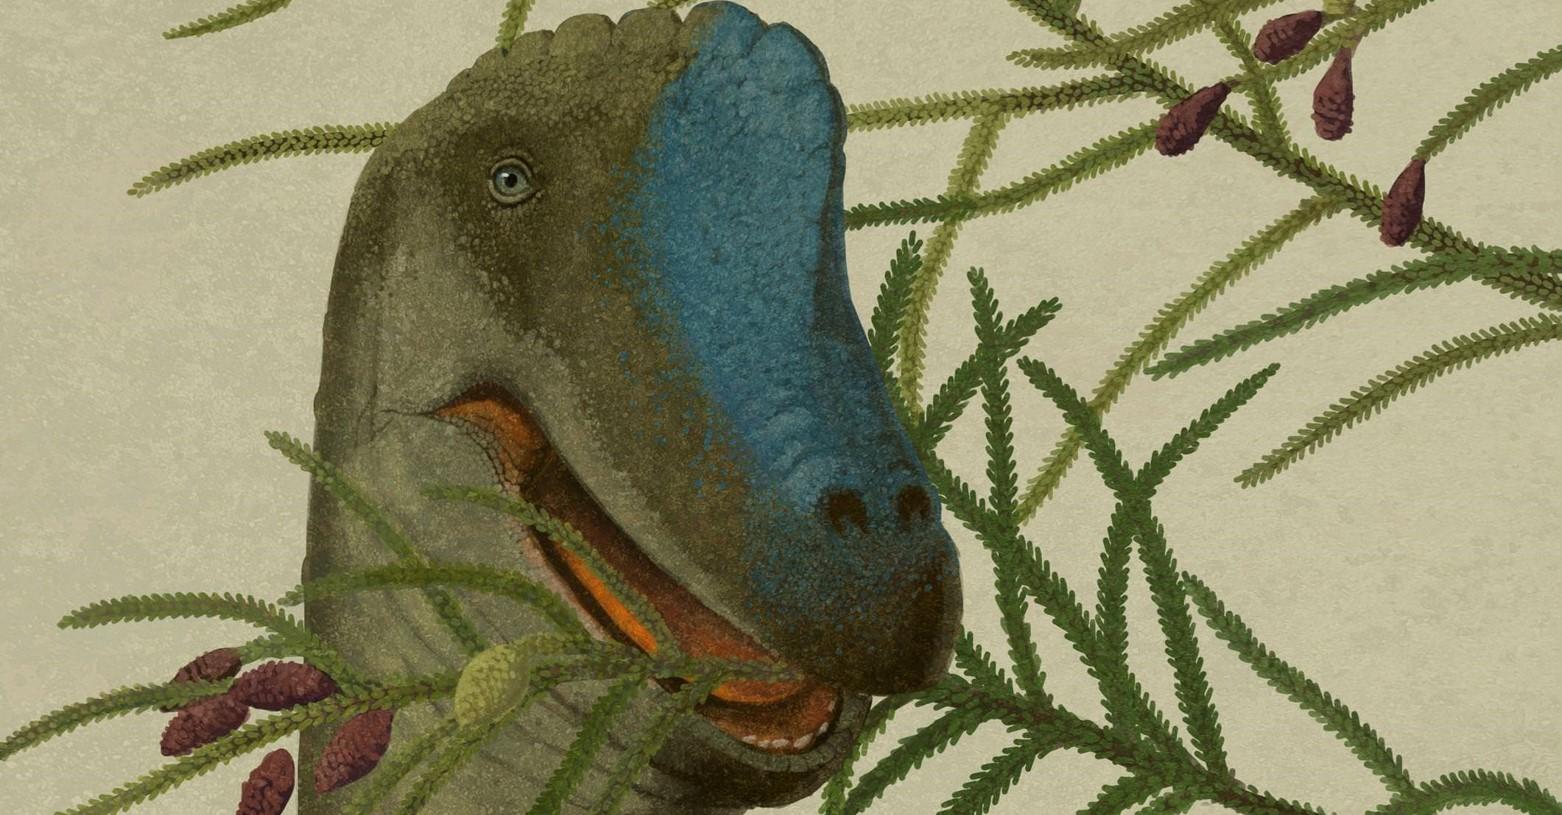 brachiosaurus_2020_fb.jpg